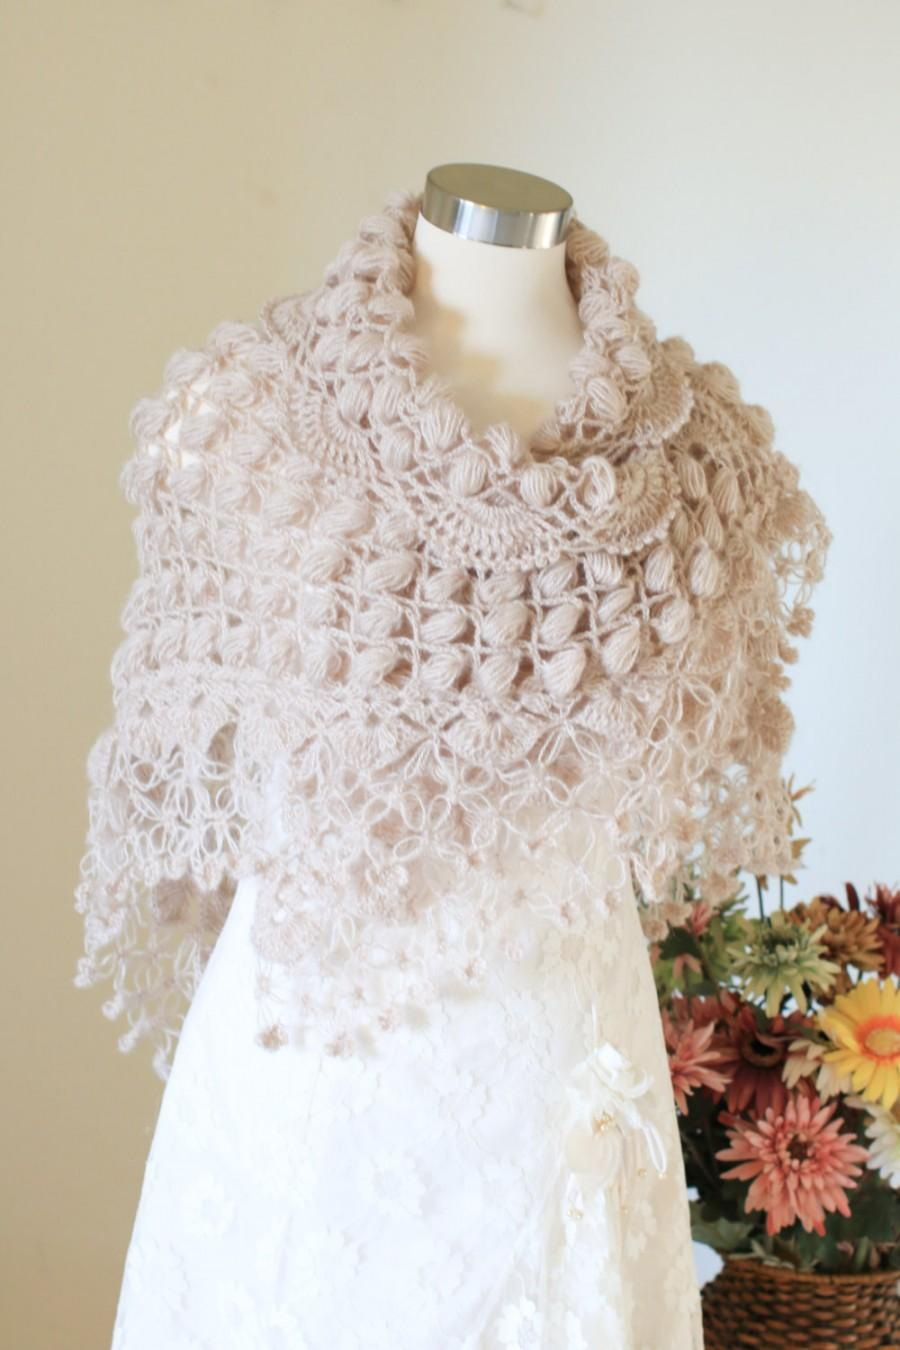 Mariage - Winter Wedding,Crochet Shawl, Beige Shawl, Shawl, Bridal Cape, Wedding Cape, Bridal Wrap, Bridal Bolero, Wedding Shawl, Bridal Shawl, Cape